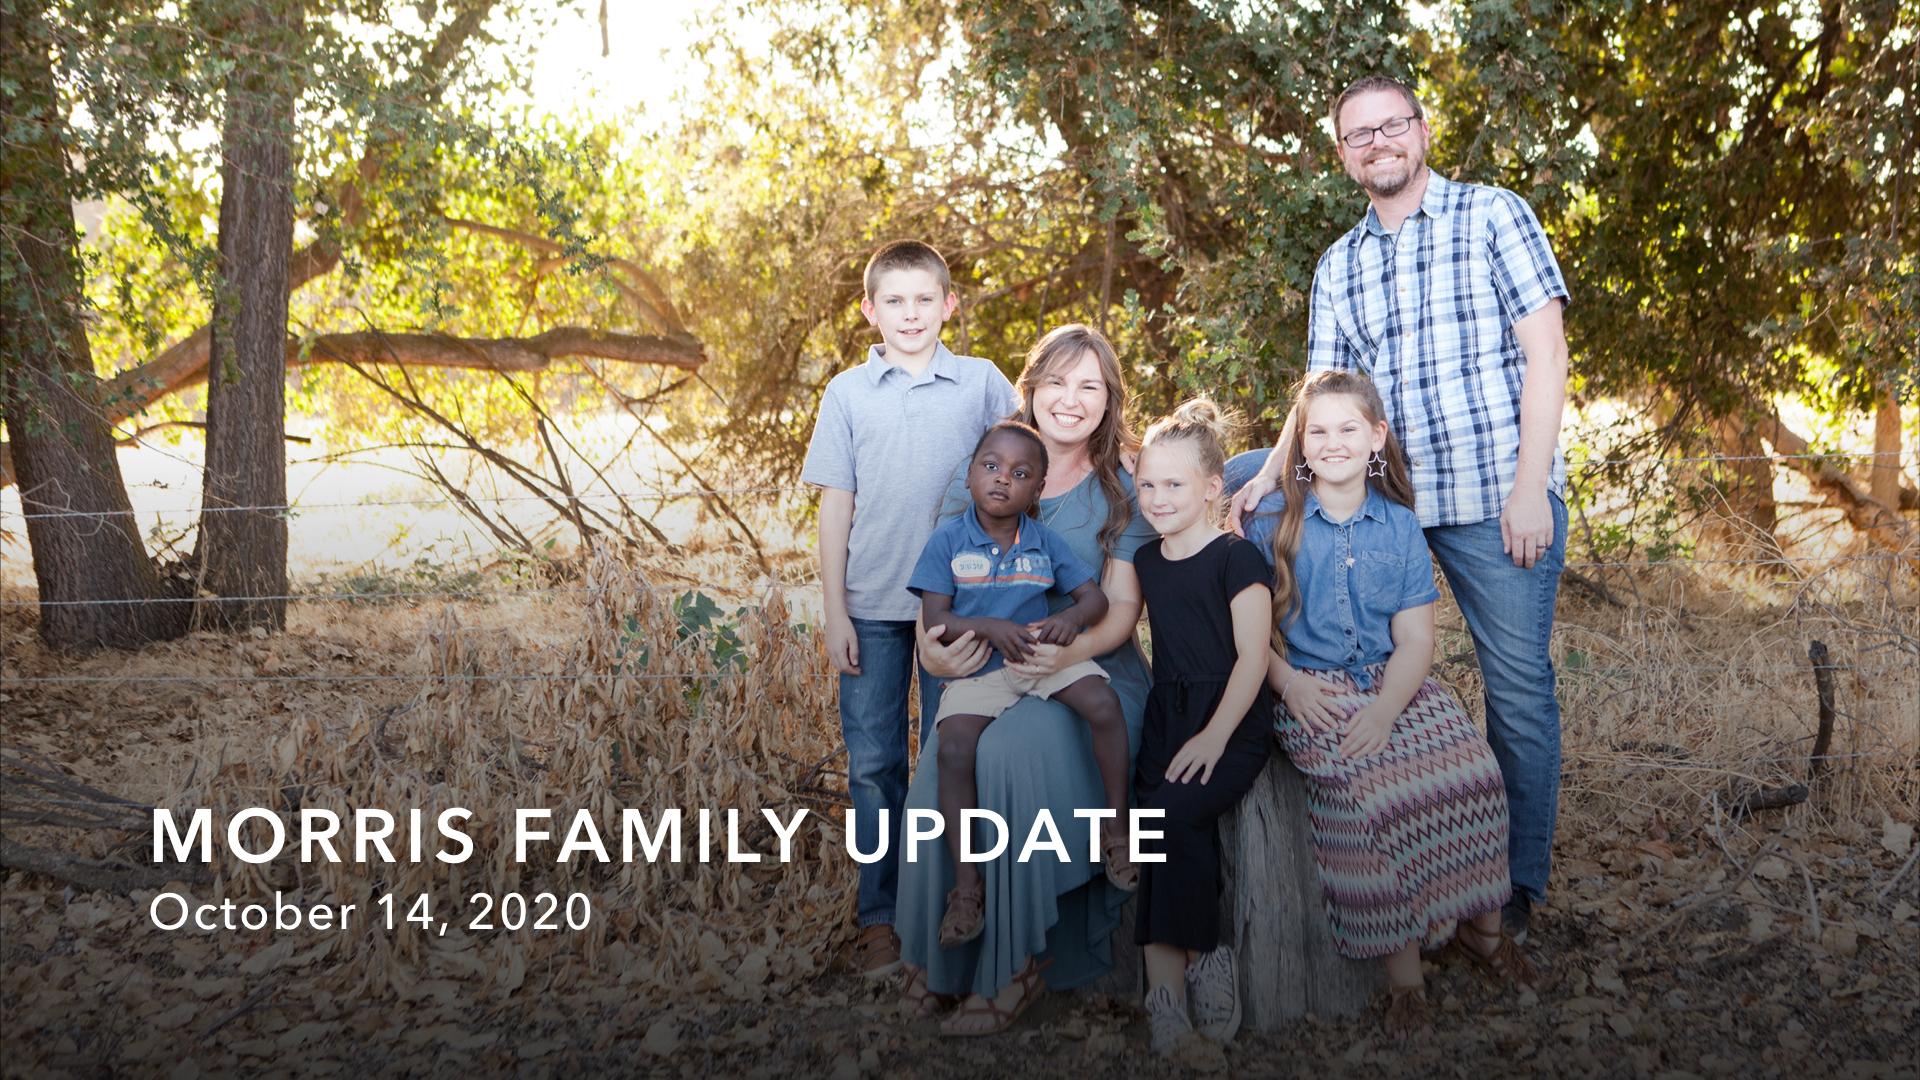 201014-Morris-Family-Update-16x9